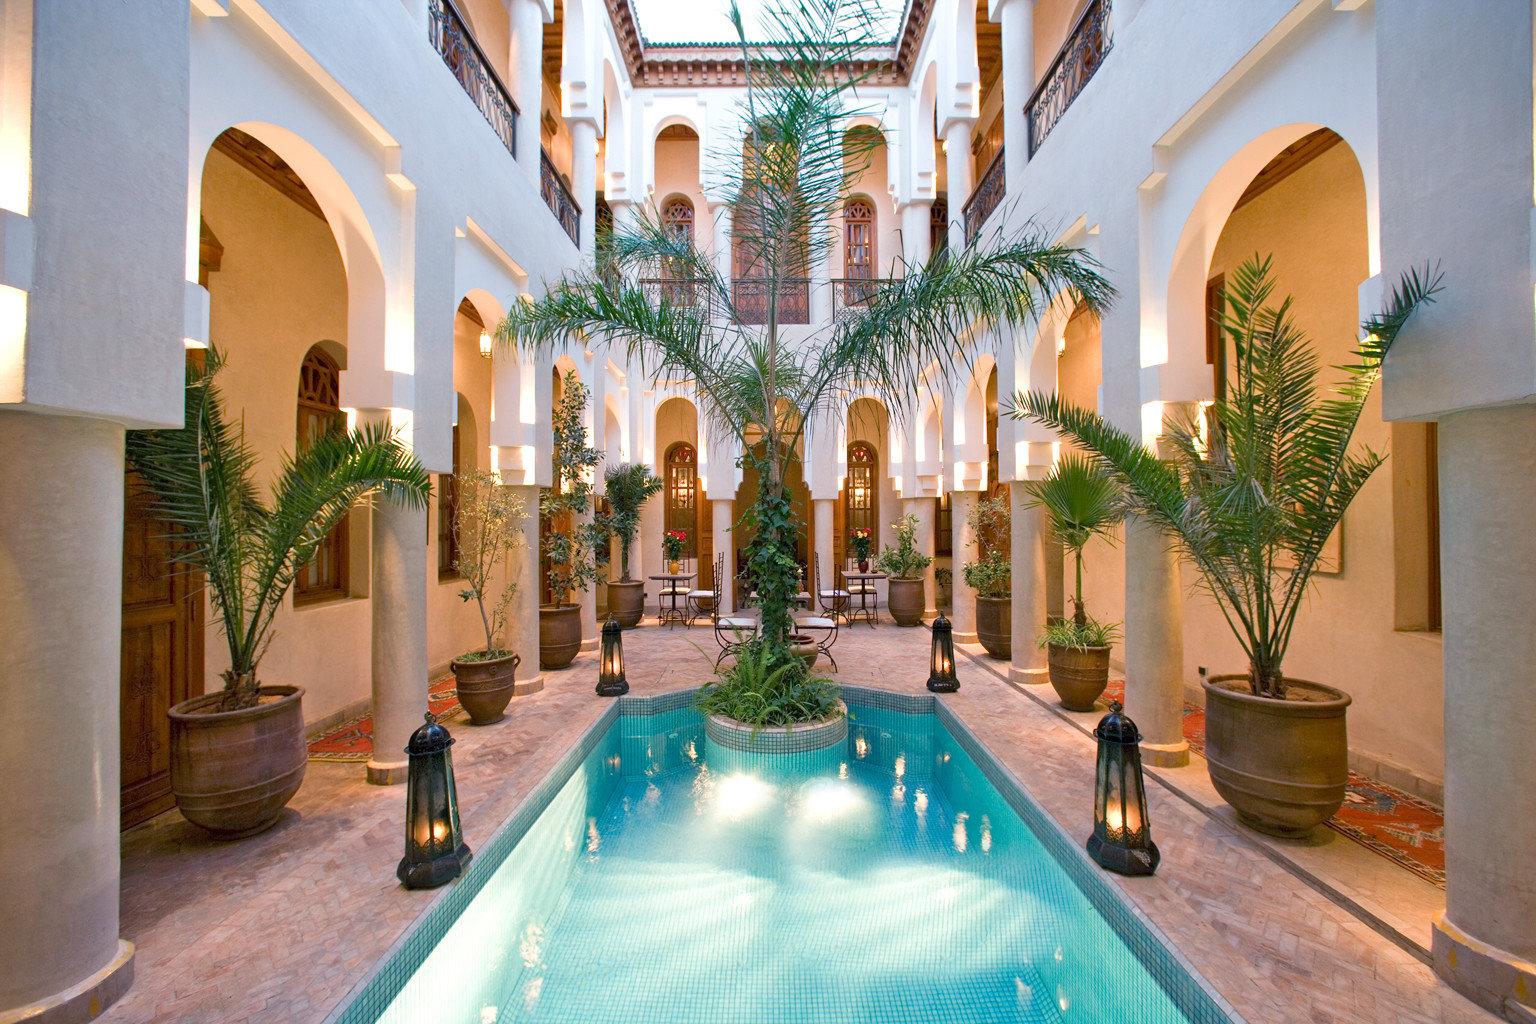 Cultural Lobby property building Resort hacienda swimming pool Villa mansion Courtyard palace